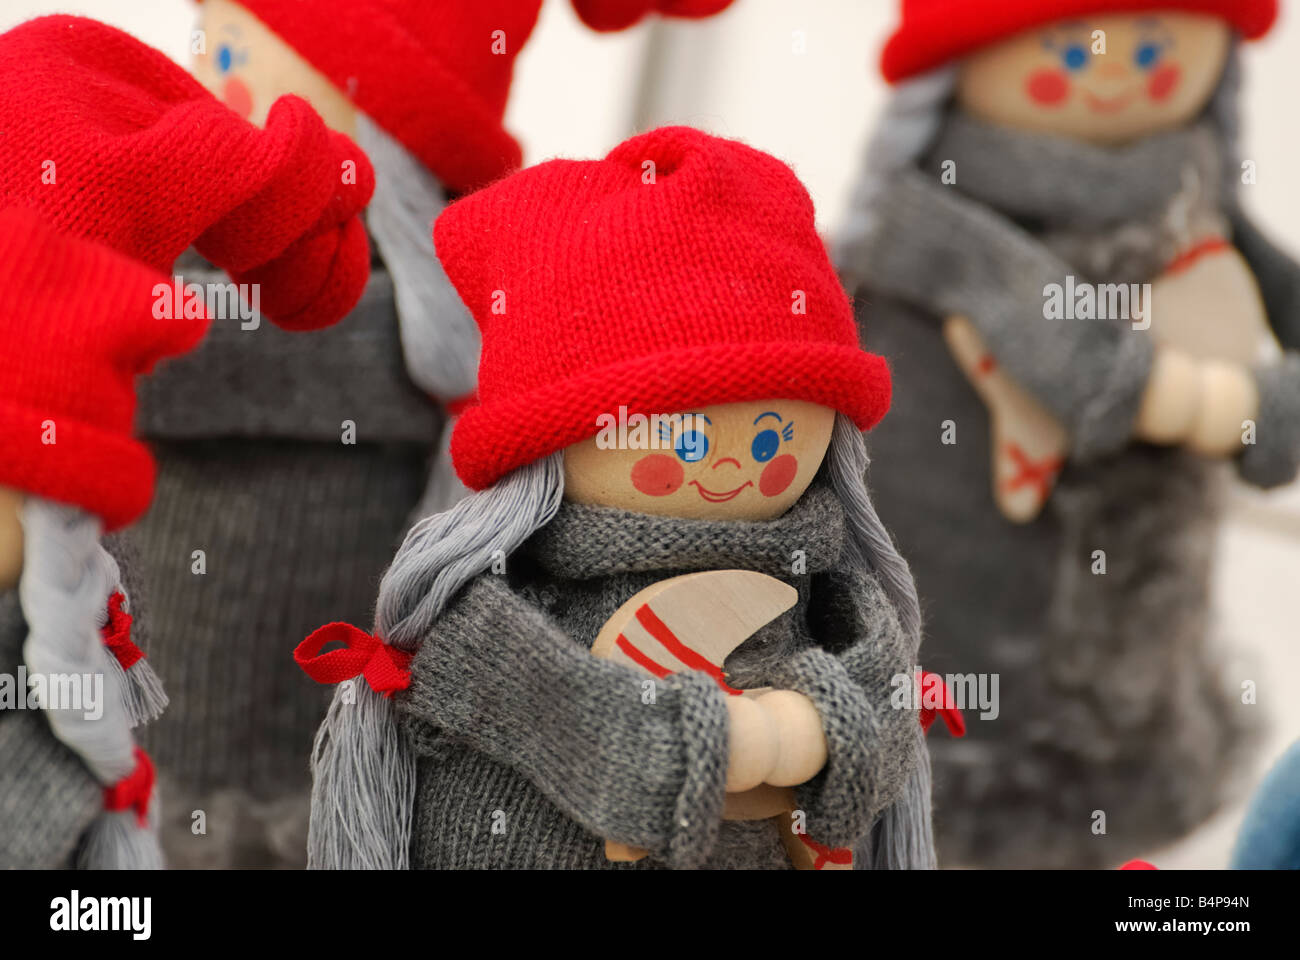 Finnish dolls in red caps Helsinki Finland - Stock Image